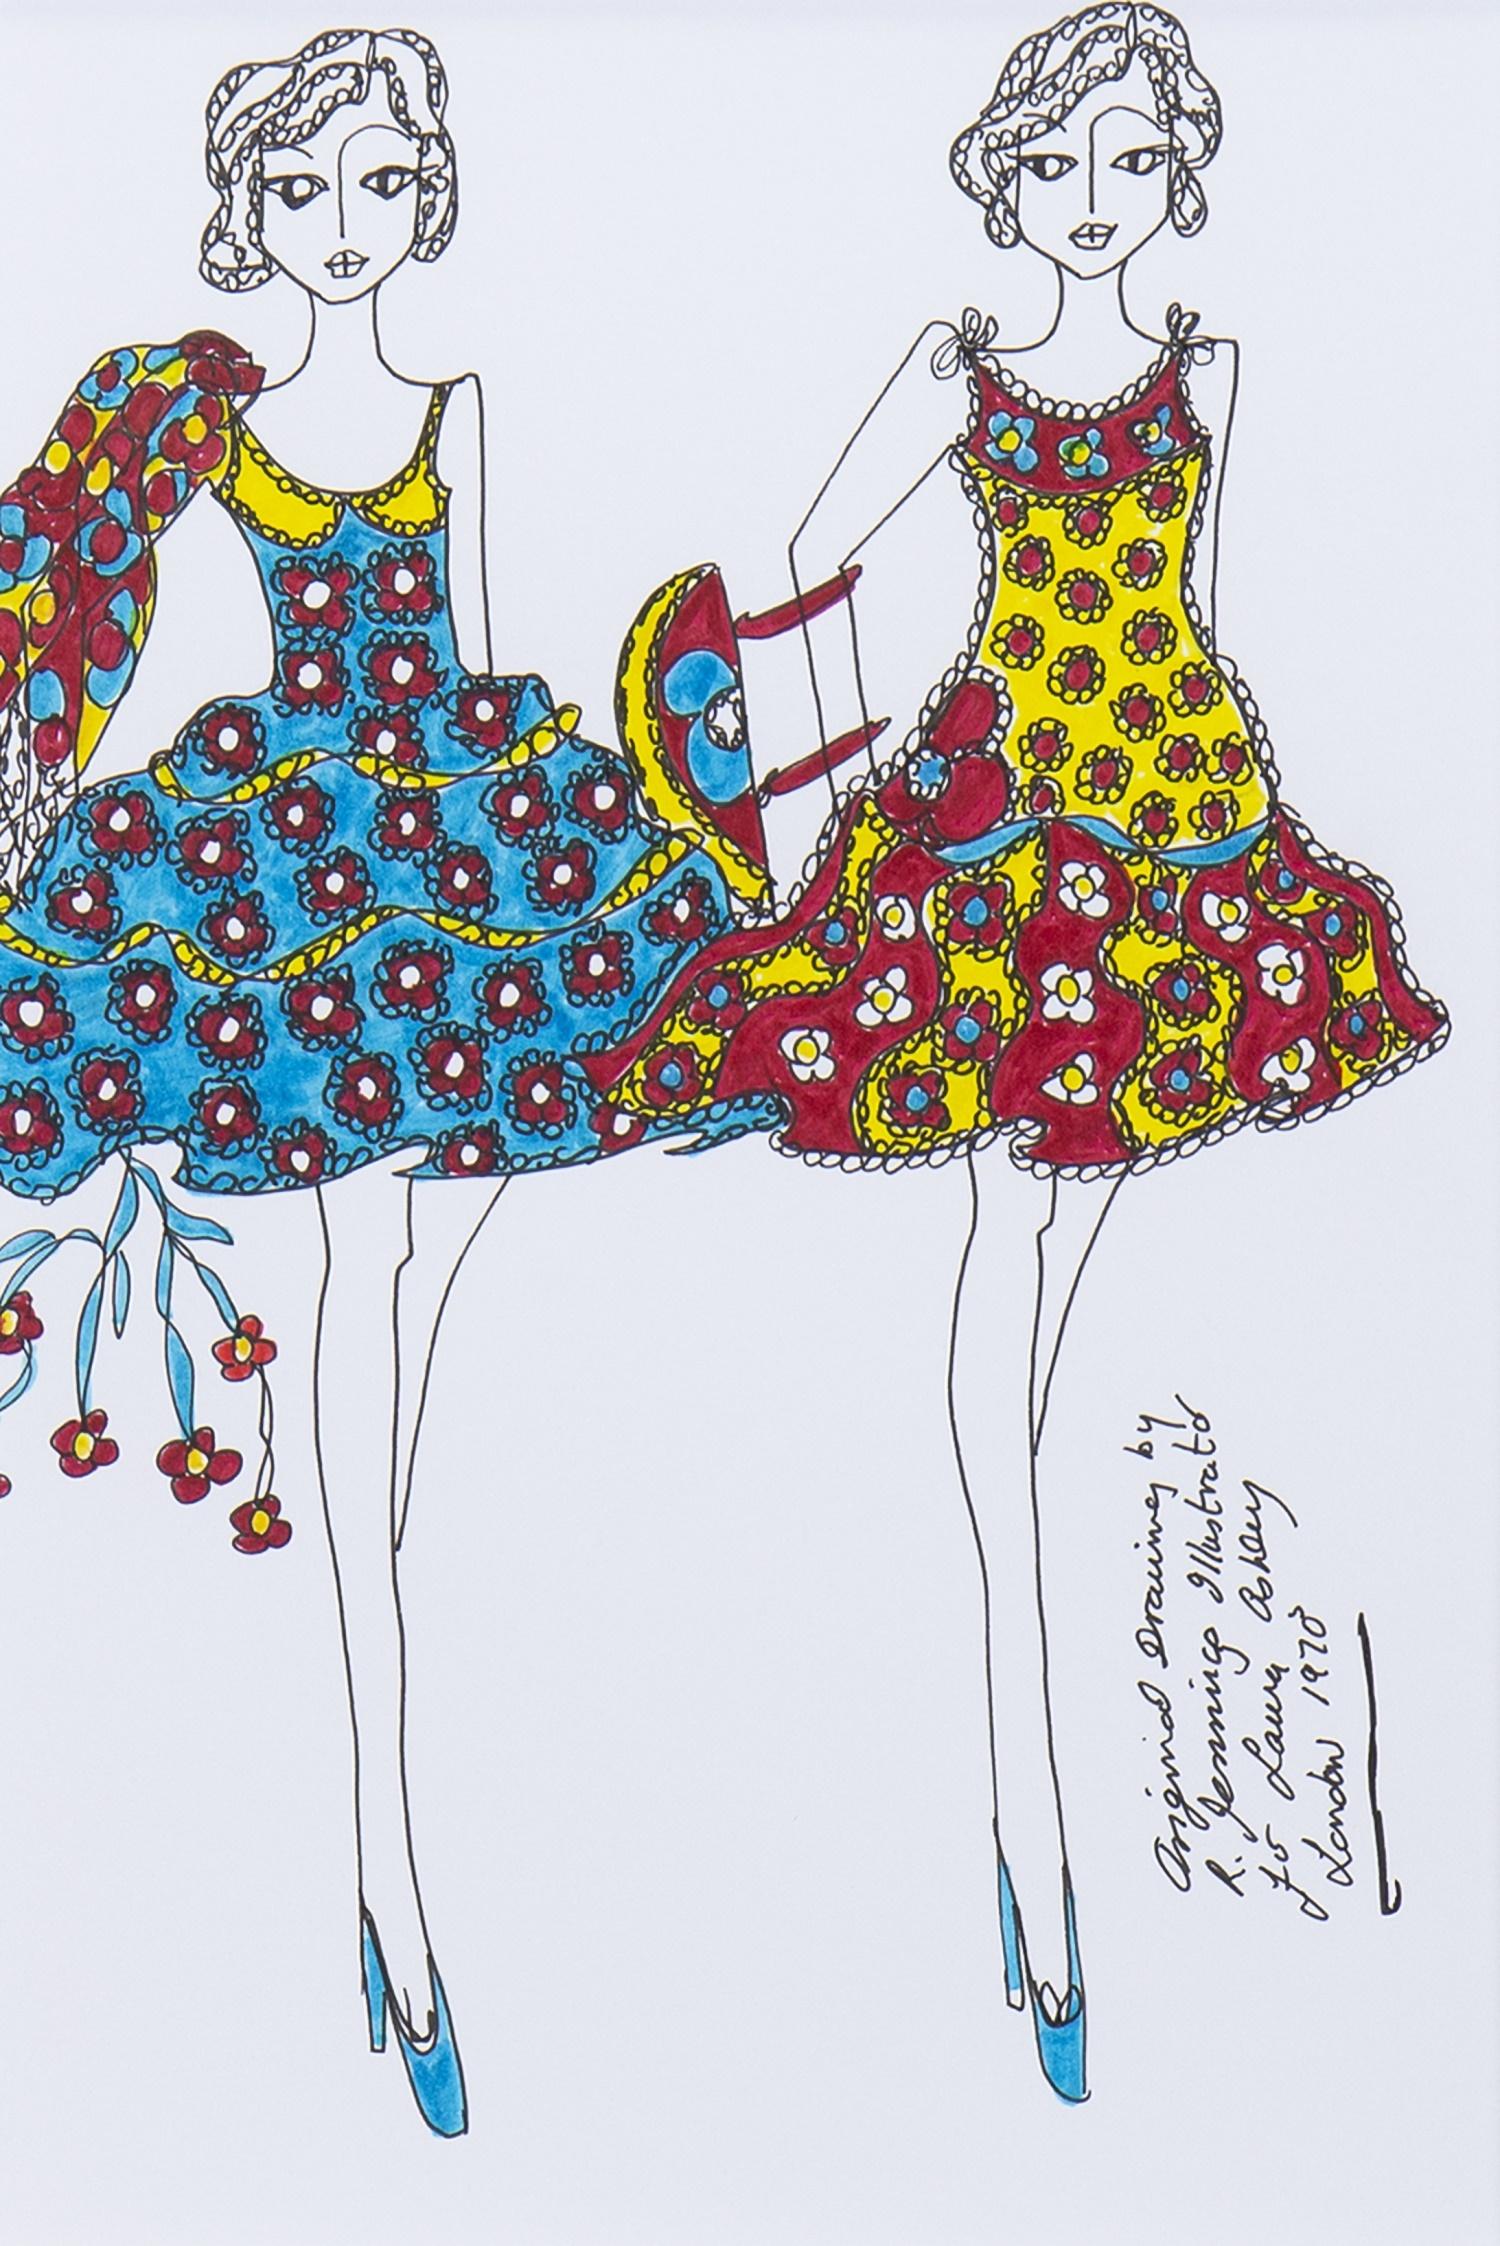 Lot 39 - ORIGINAL ILLUSTRATION OF DESIGNS FOR LAURA ASHLEY, BY ROZ JENNINGS